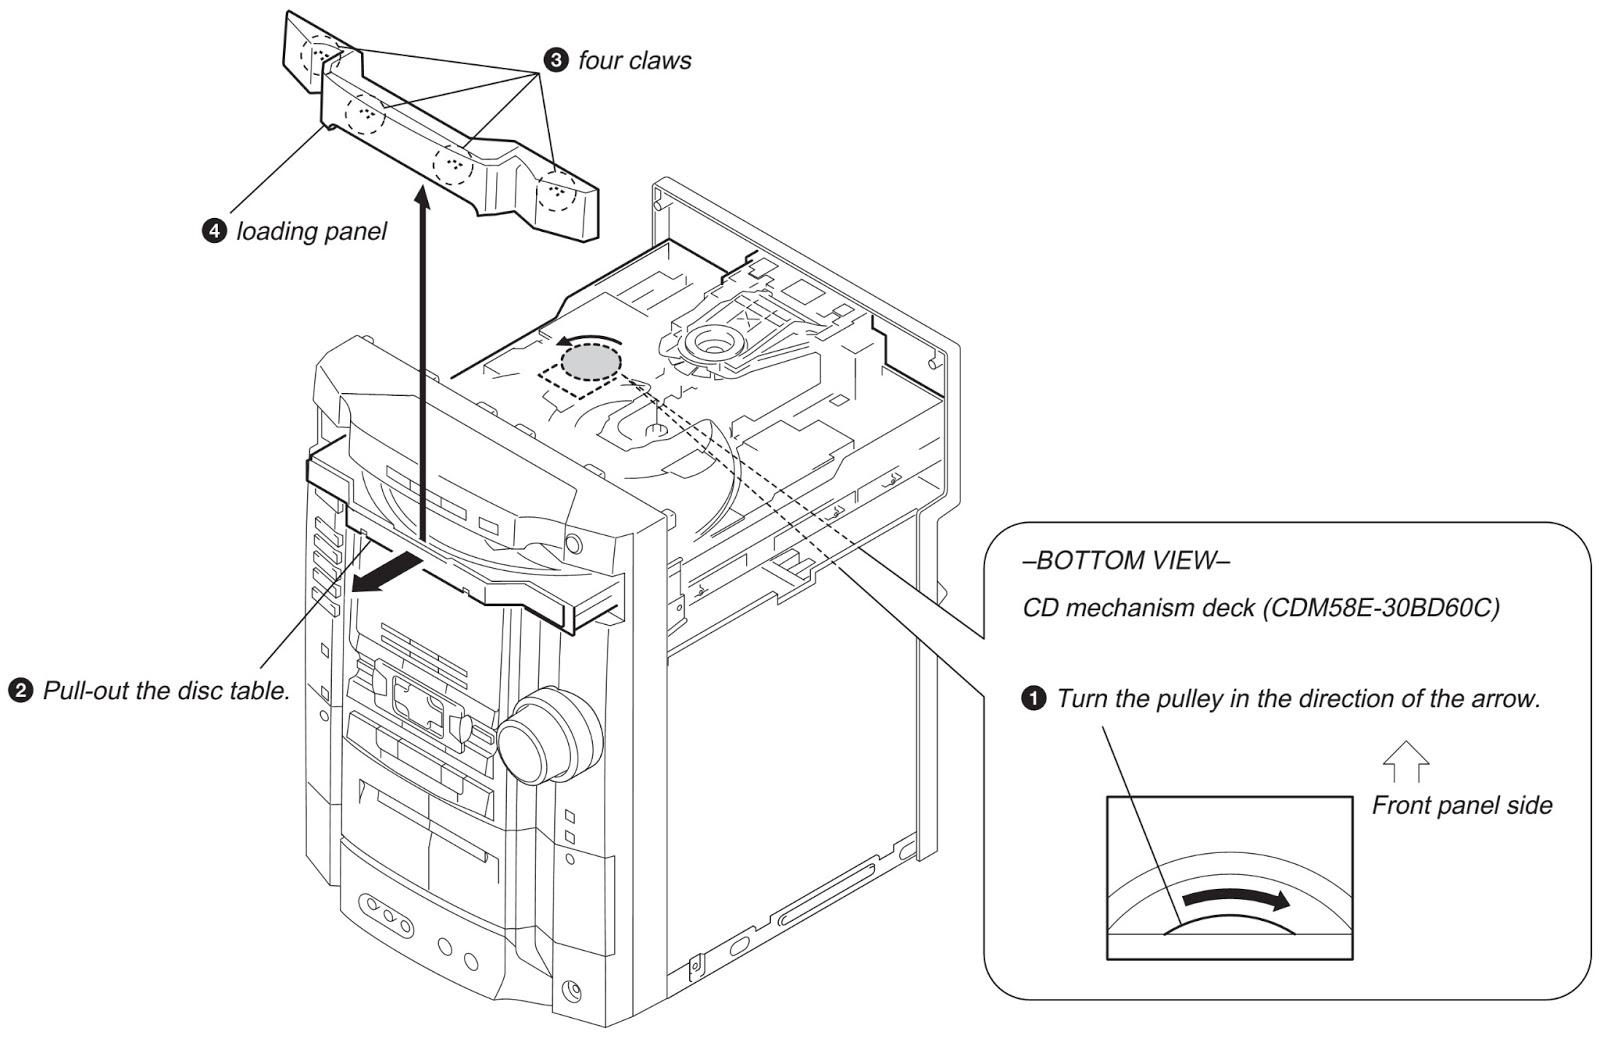 sony hcdzux10d diagram